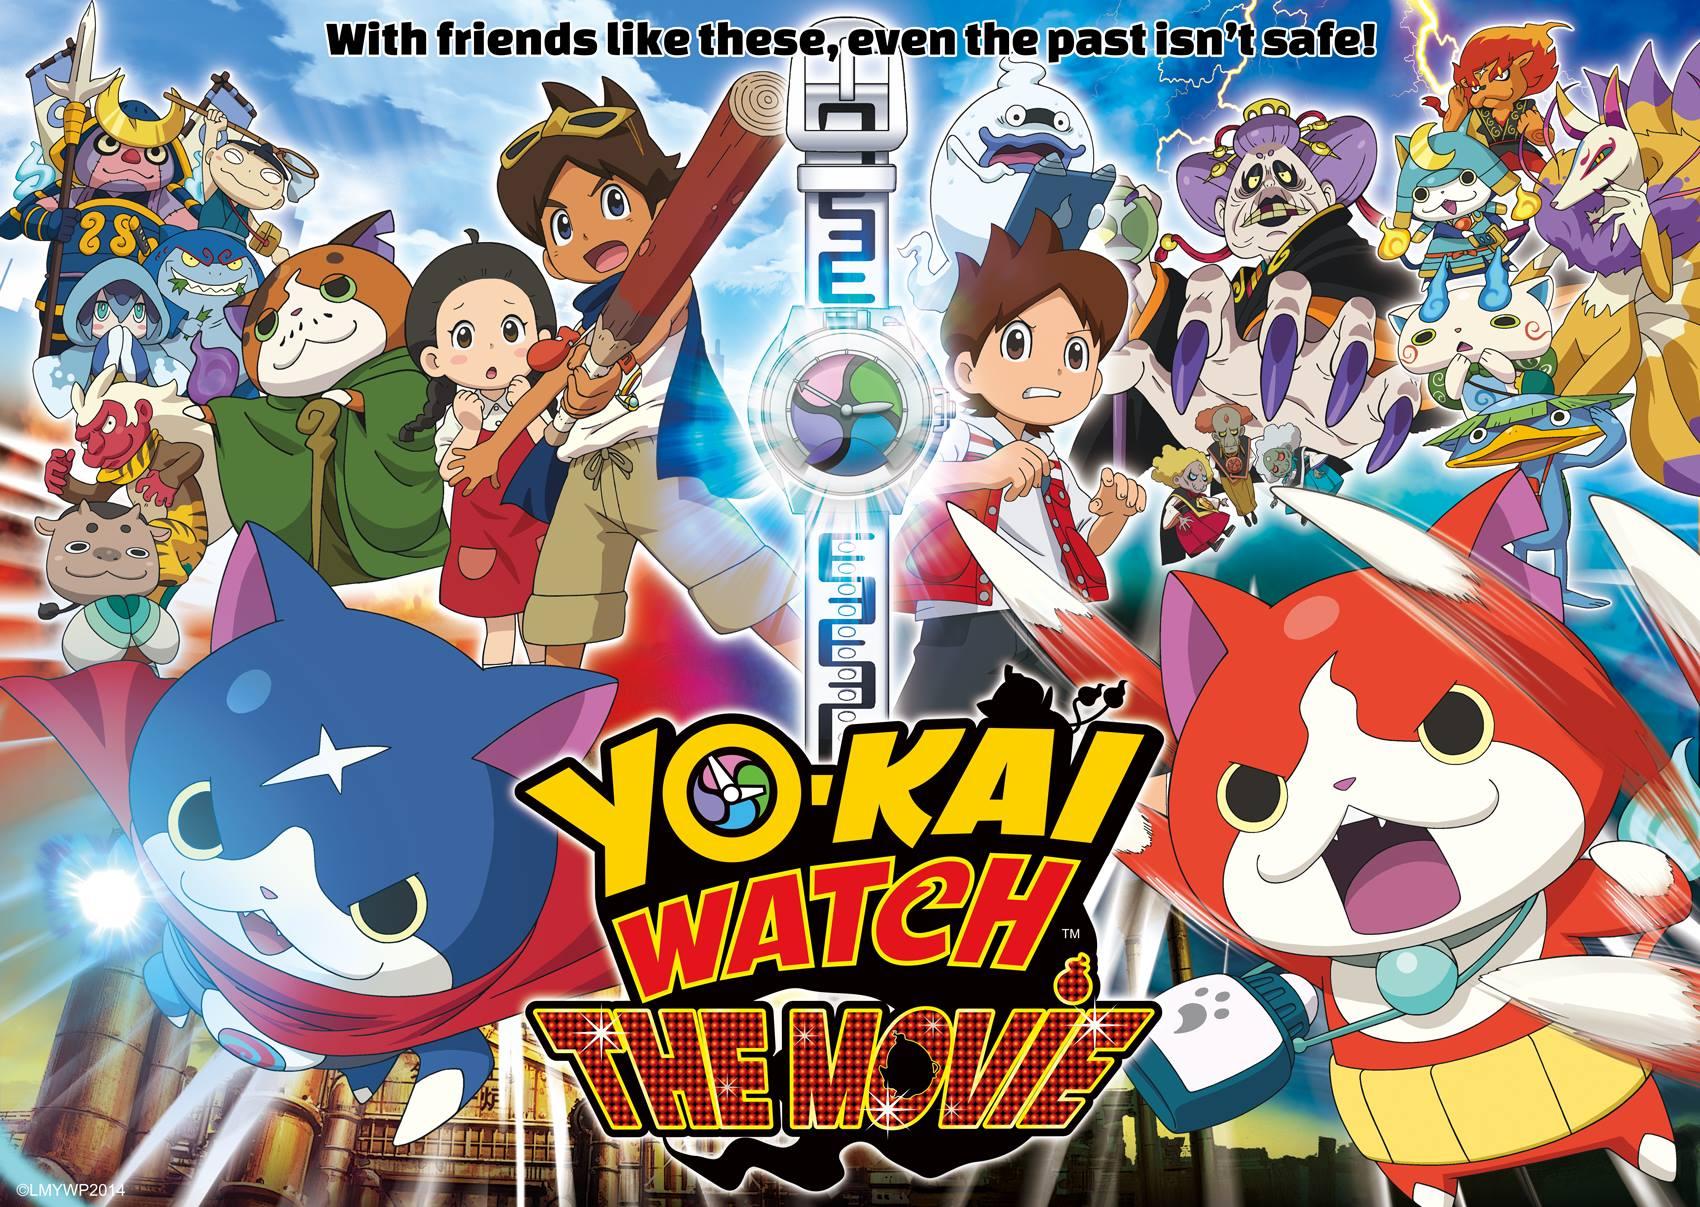 Yo-kai Watch movie event!